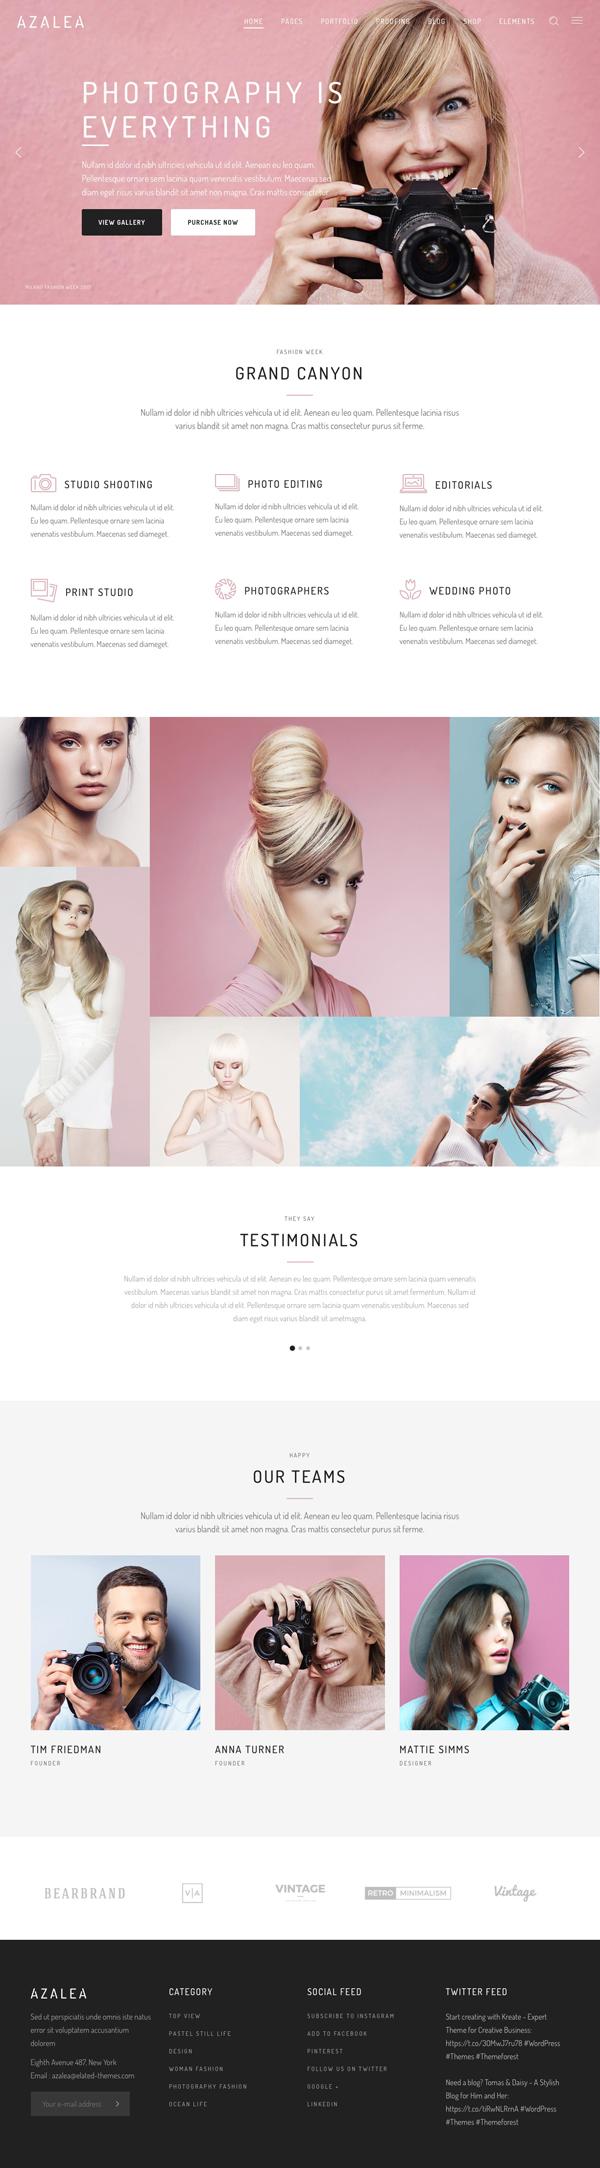 Azalea - A Fresh and Fashionable Photography Theme